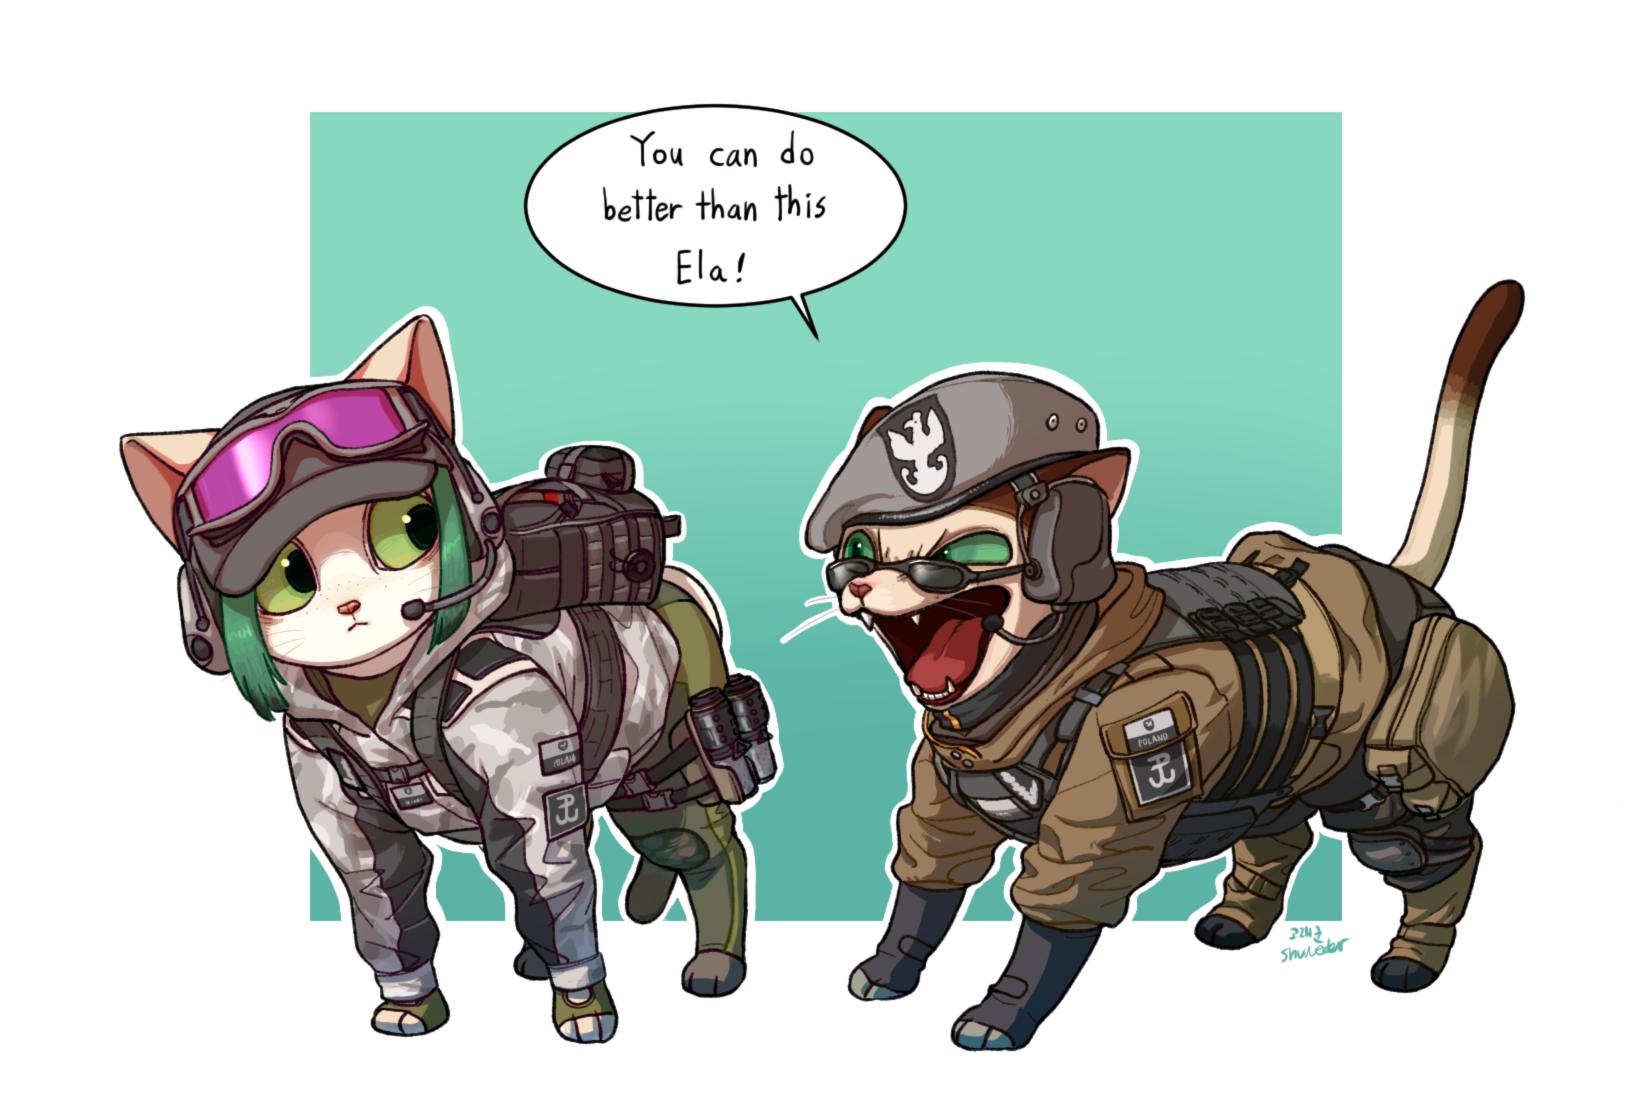 Pin By Mario S Multiverse On Rainbow Six Siege Art And Fun Stuff